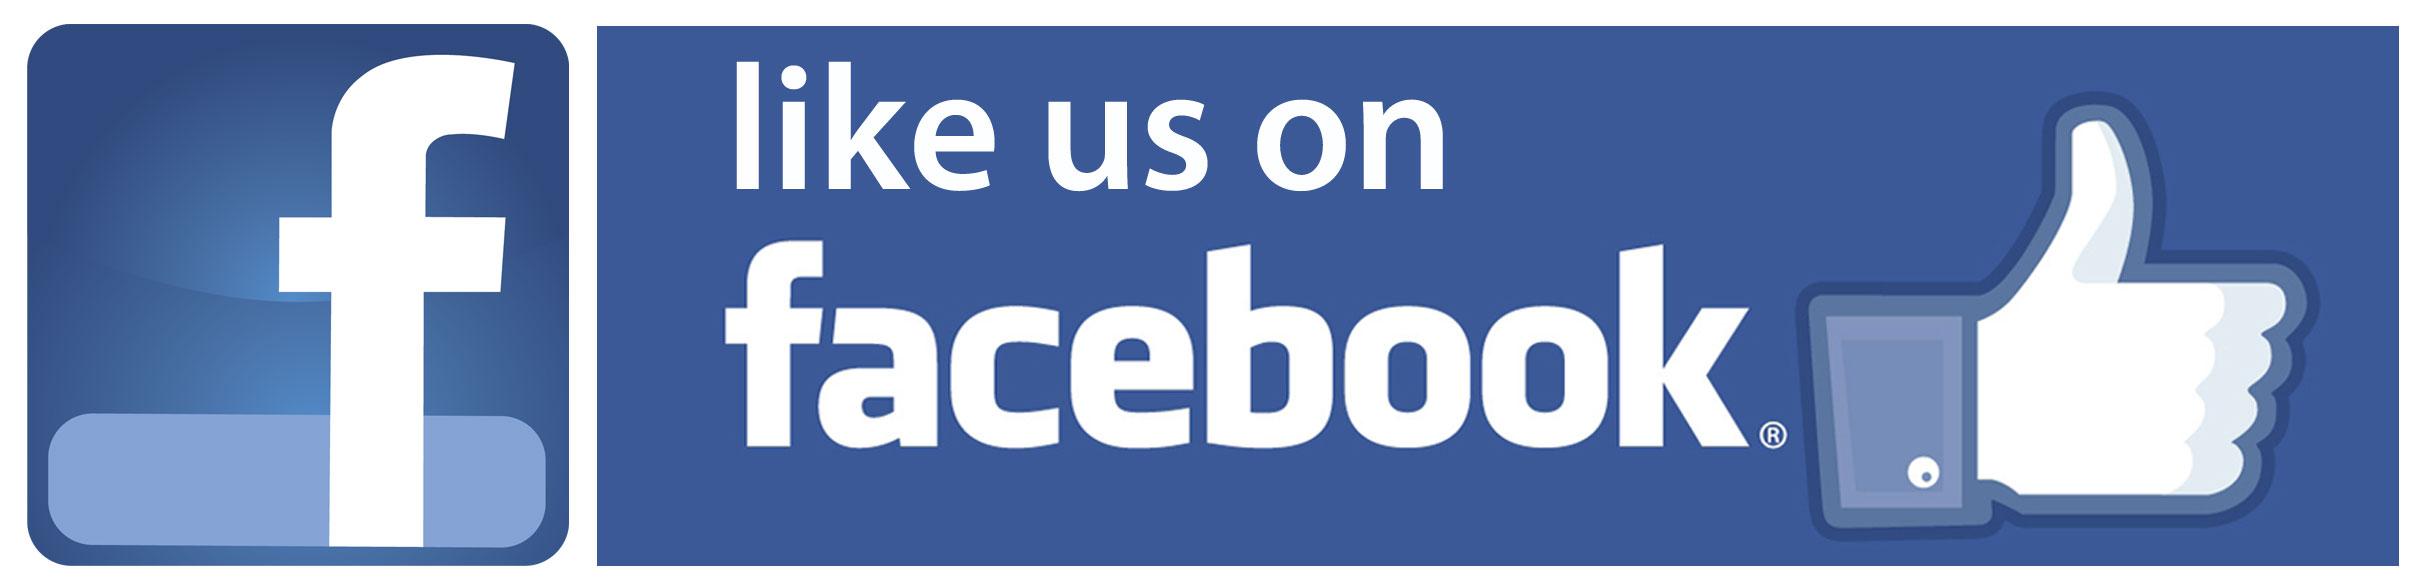 2429x587 Facebook Logo Transparent Png Pictures